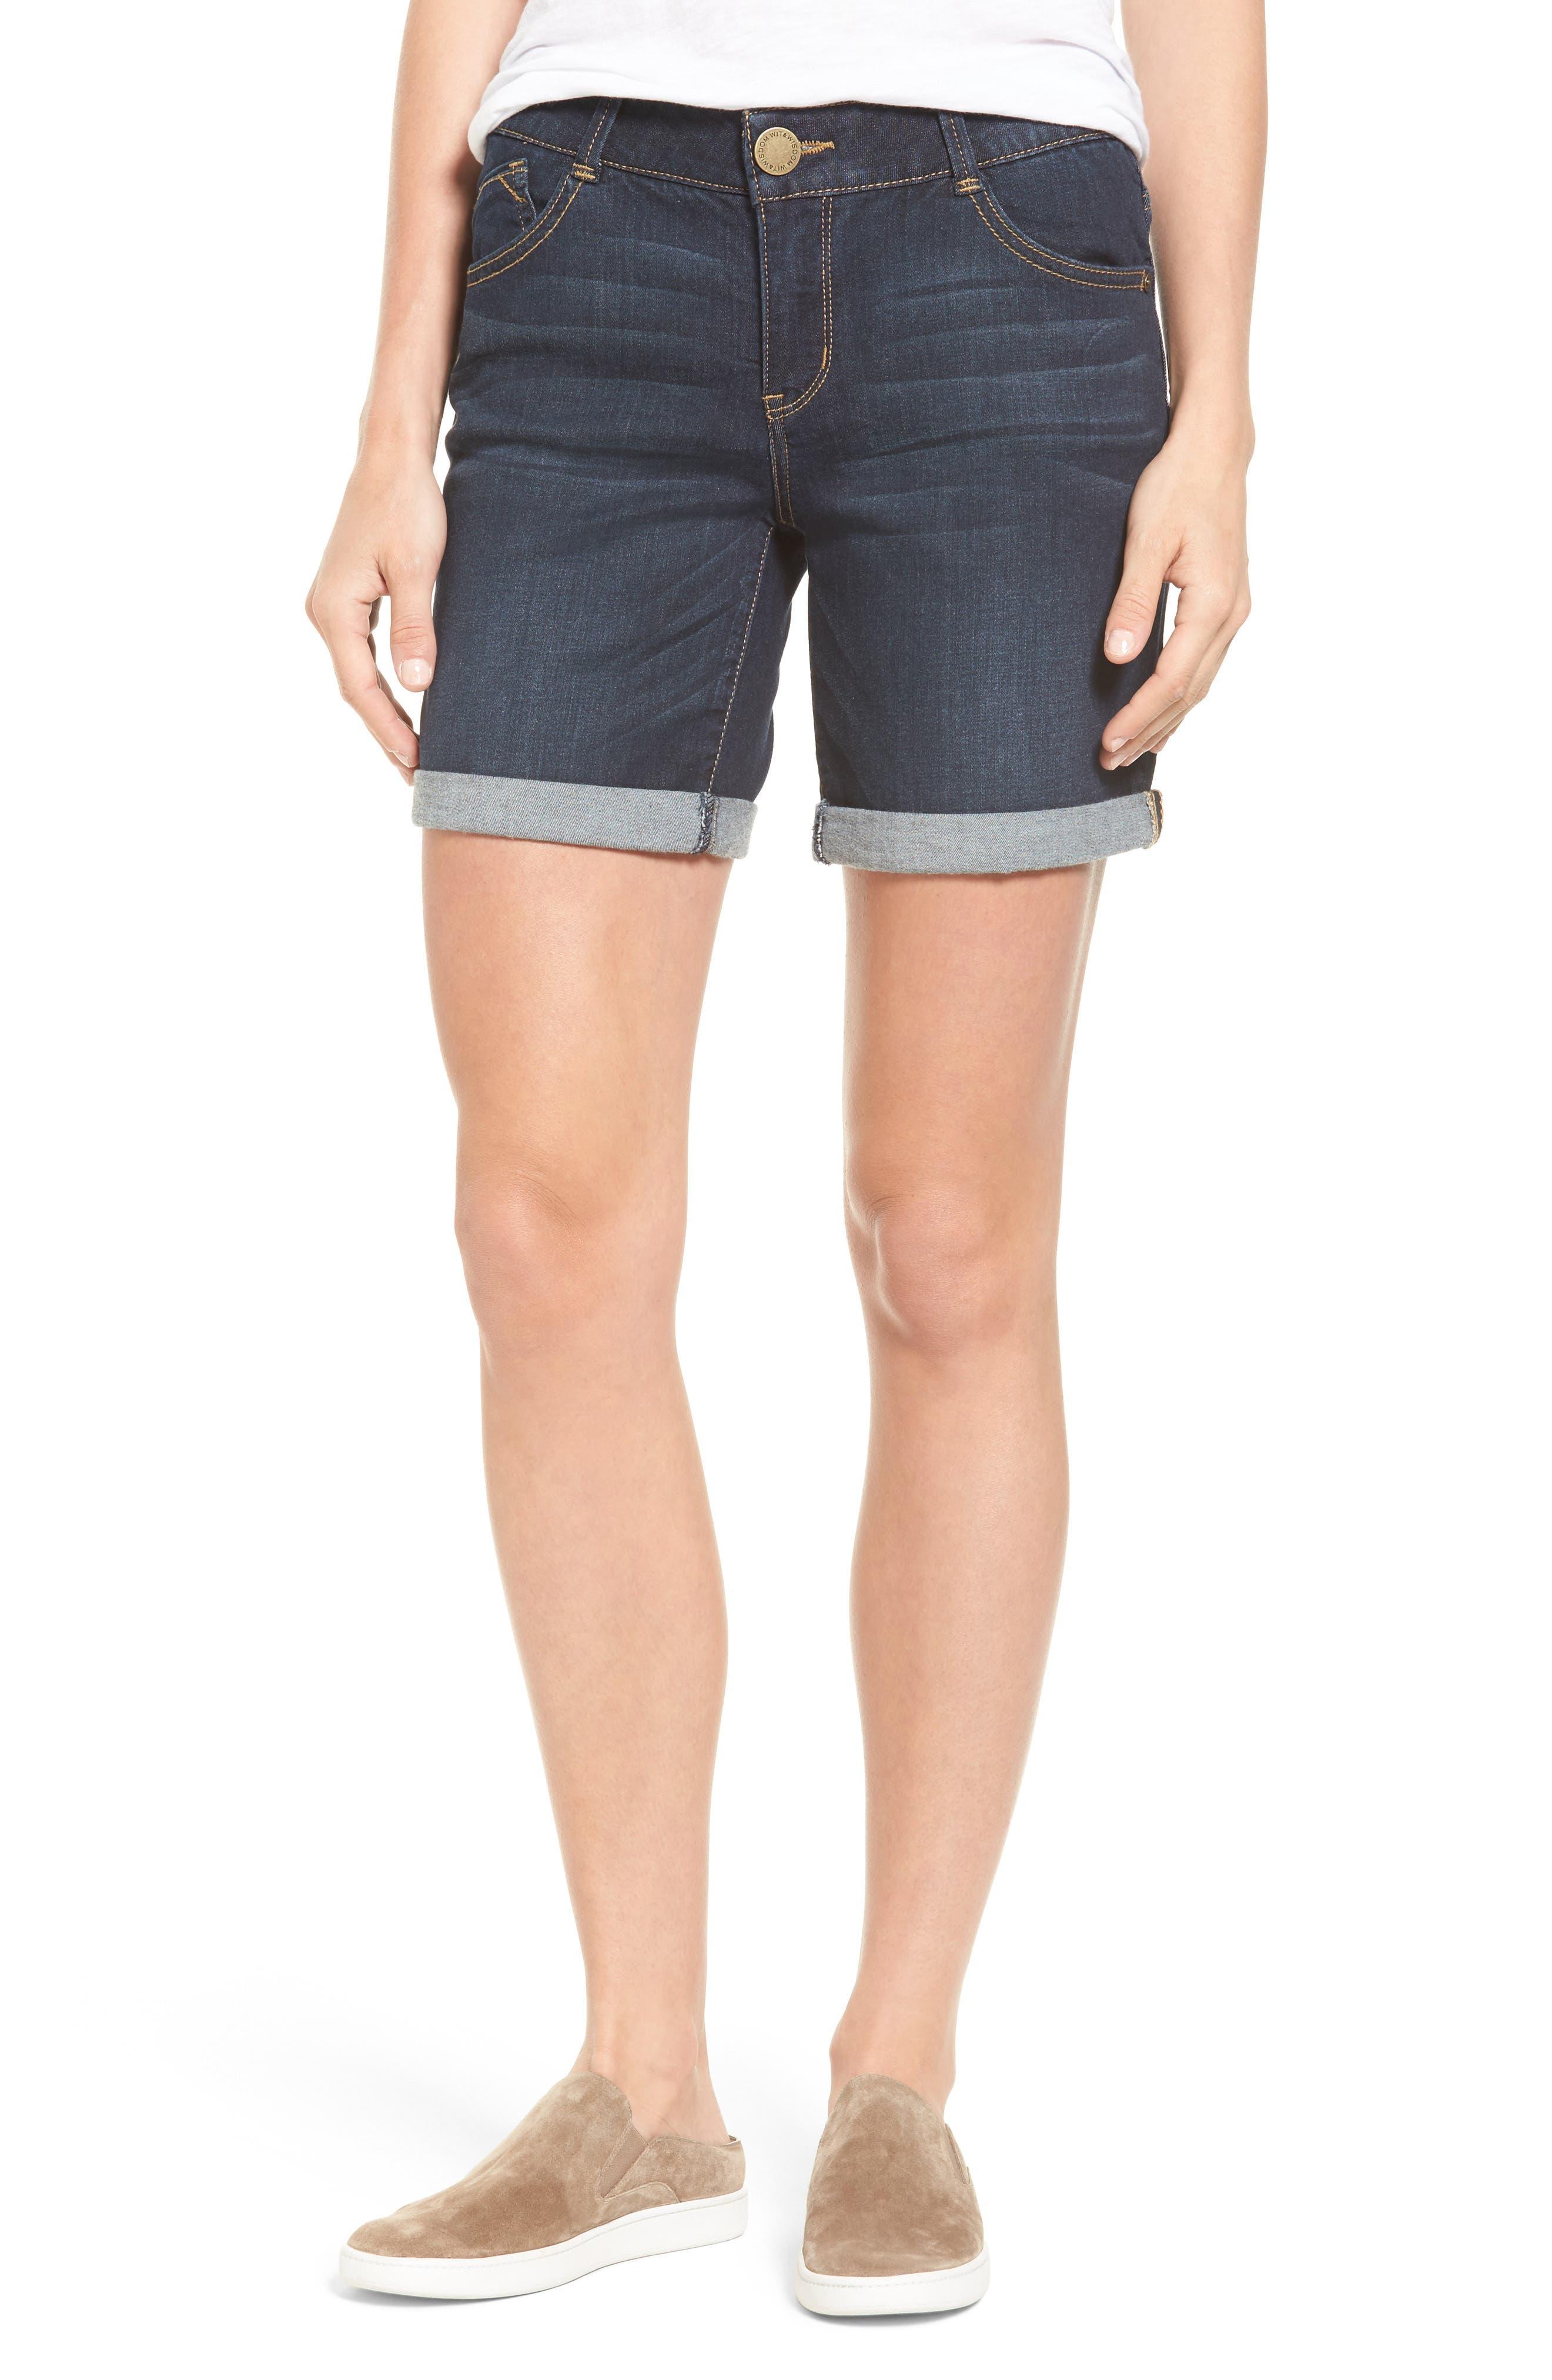 Ab-solution Cuffed Denim Shorts,                         Main,                         color,